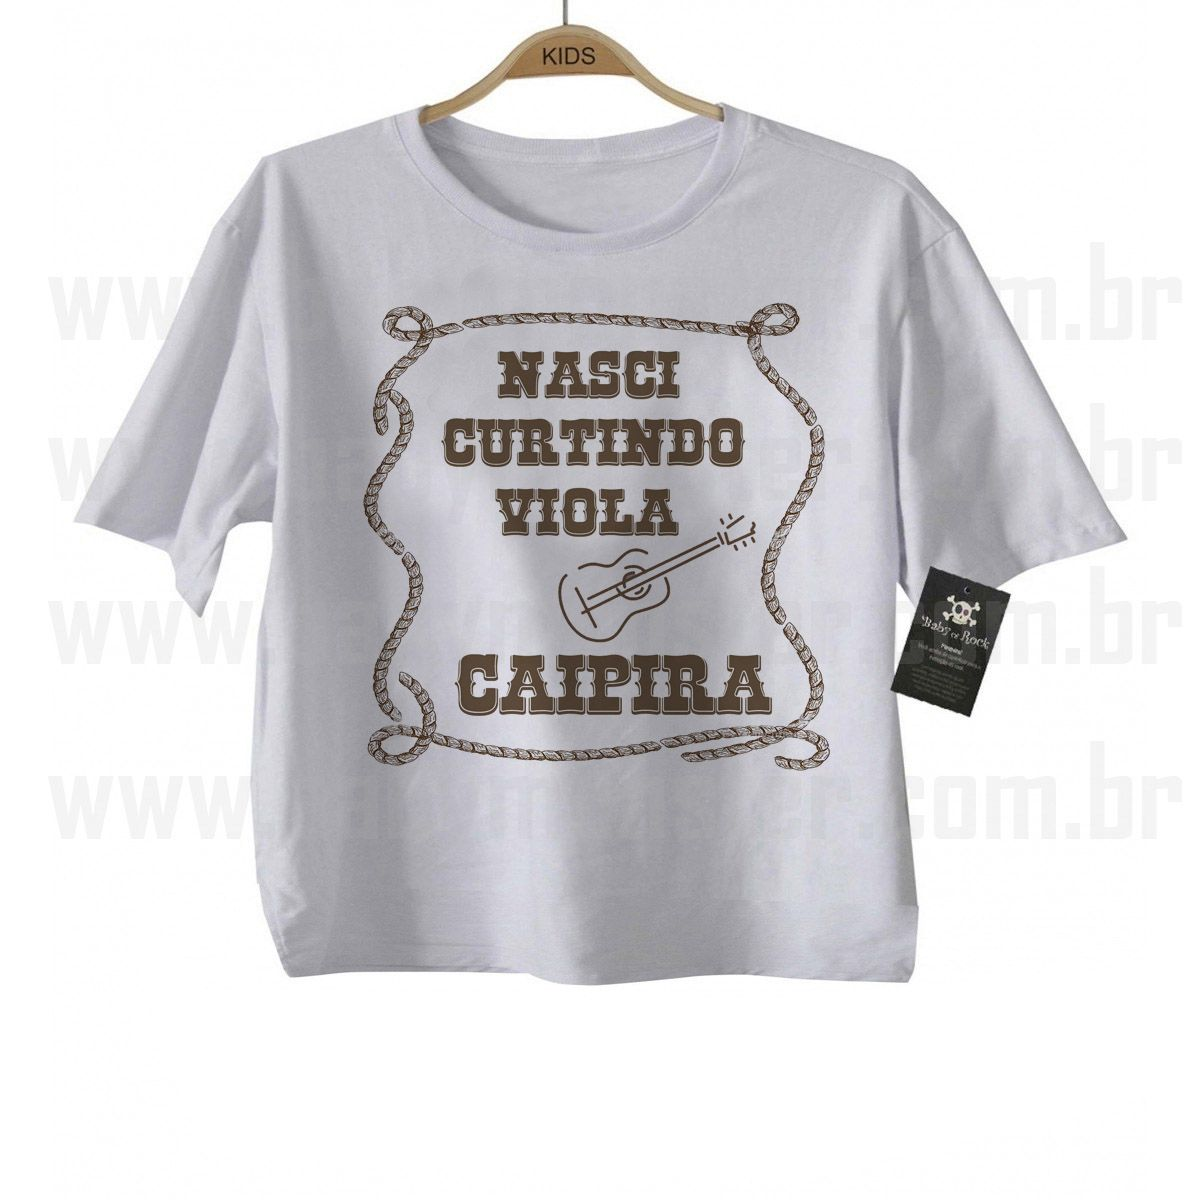 Camiseta Sertanejo Nasci Curtindo Viola - White  - Baby Monster - Body Bebe